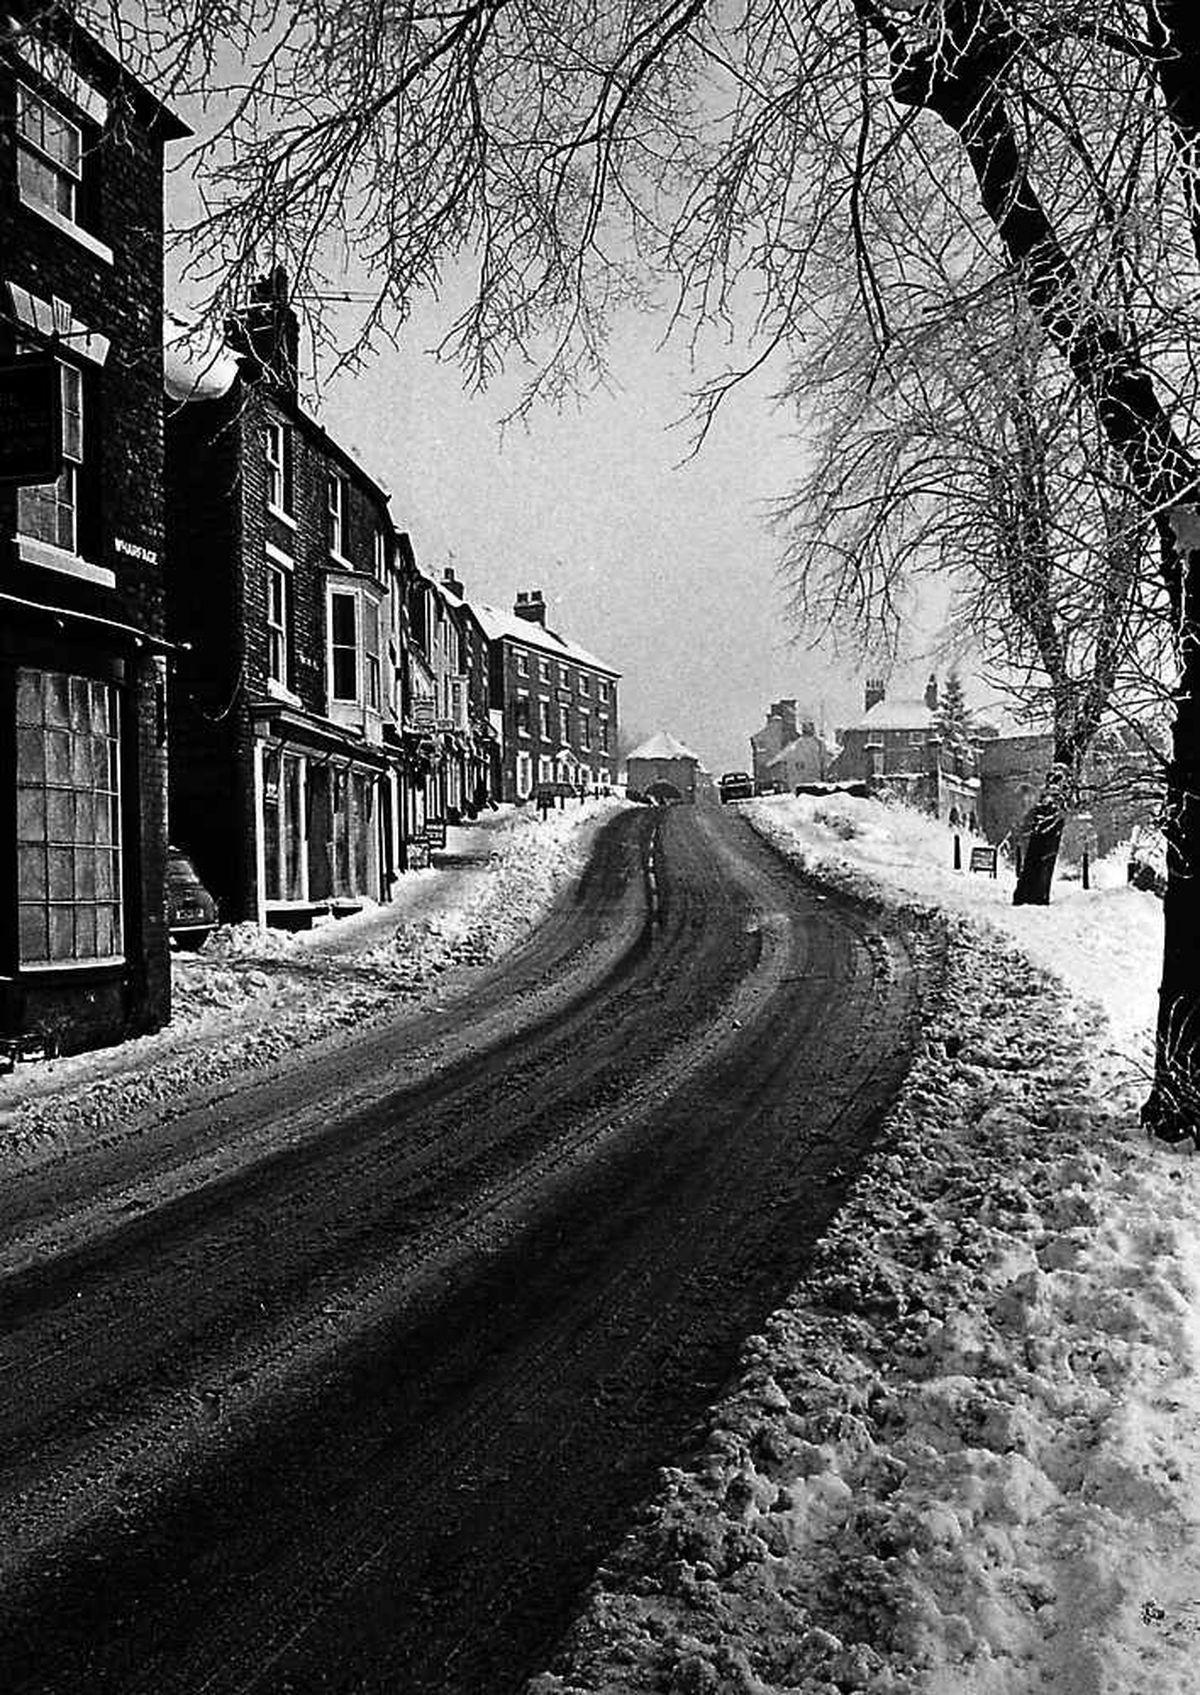 Paul Morstagg-Higgs' snowy Tontine Hill in Ironbridge